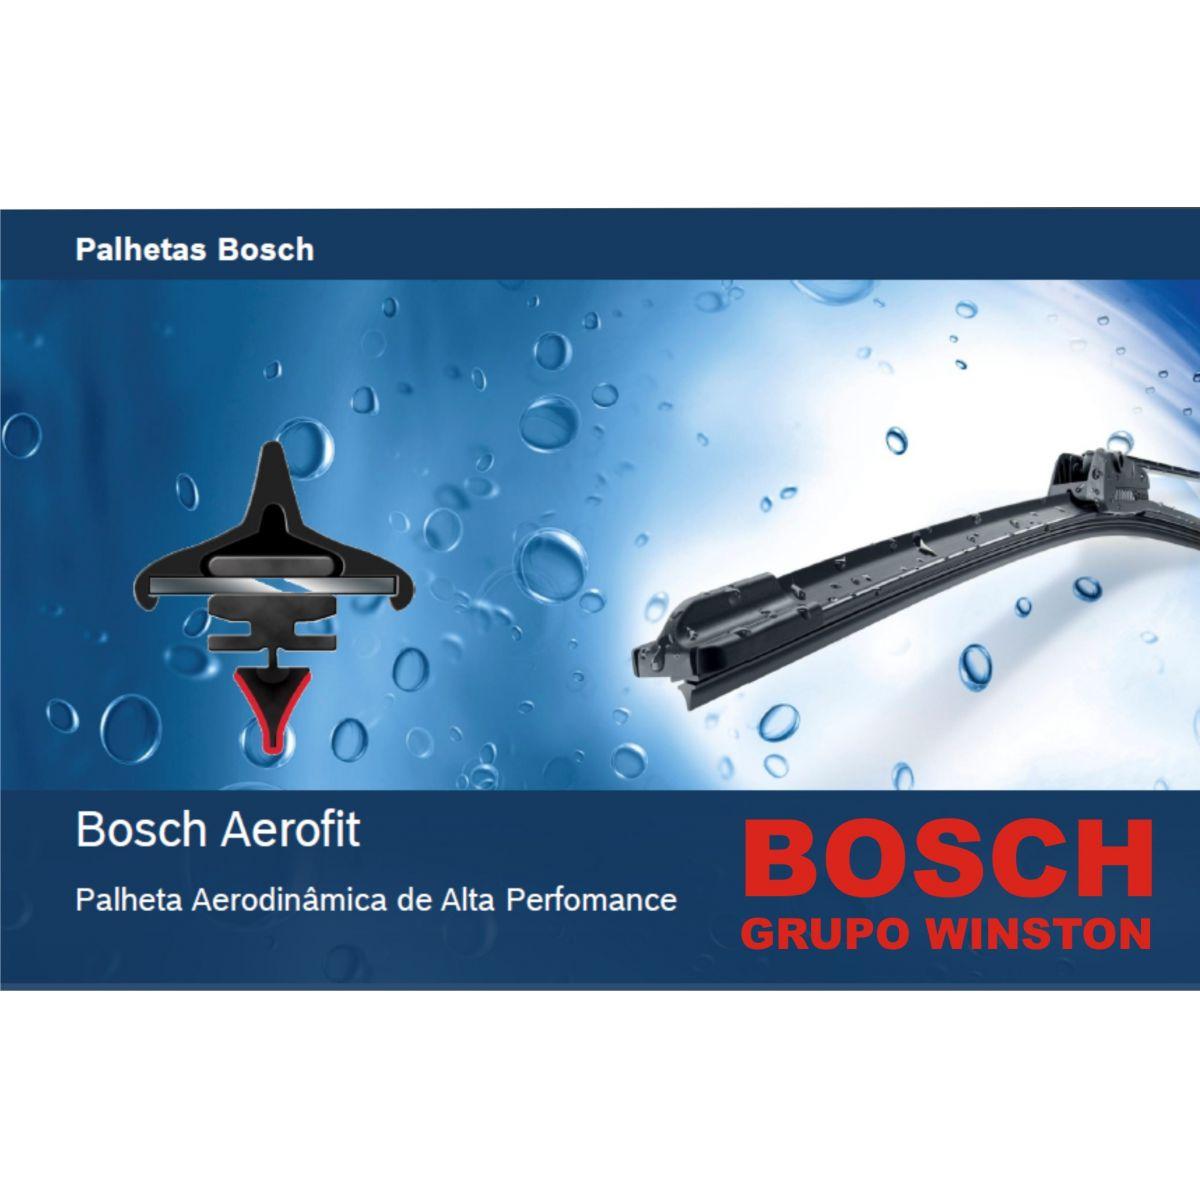 Palheta Bosch Aerofit Limpador de para brisa Bosch SUZUKI Grand Vitara